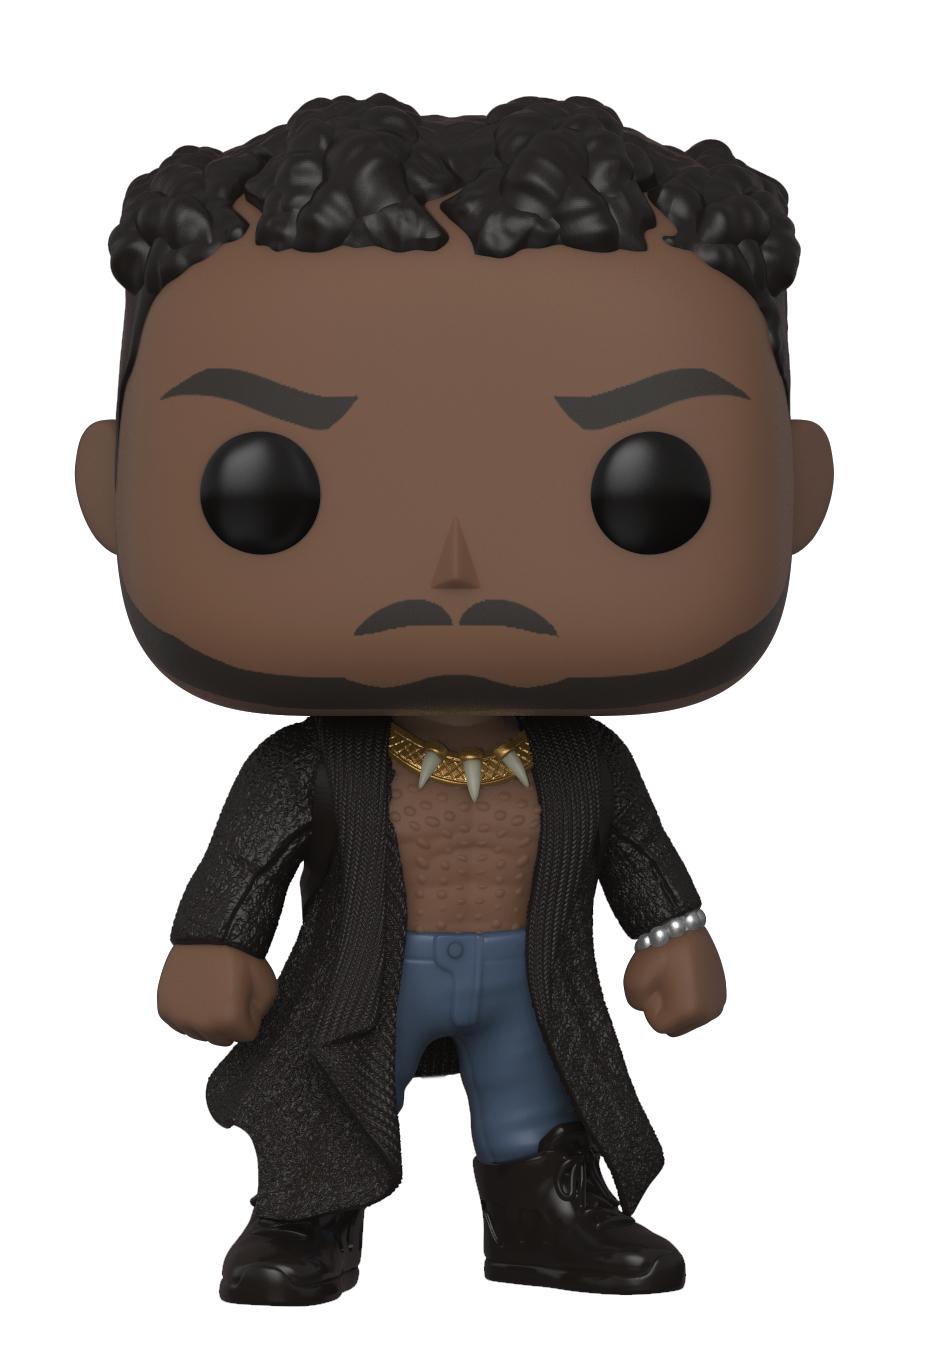 Black Panther - Erik Killmonger (With Scars) Pop! Vinyl Figure image